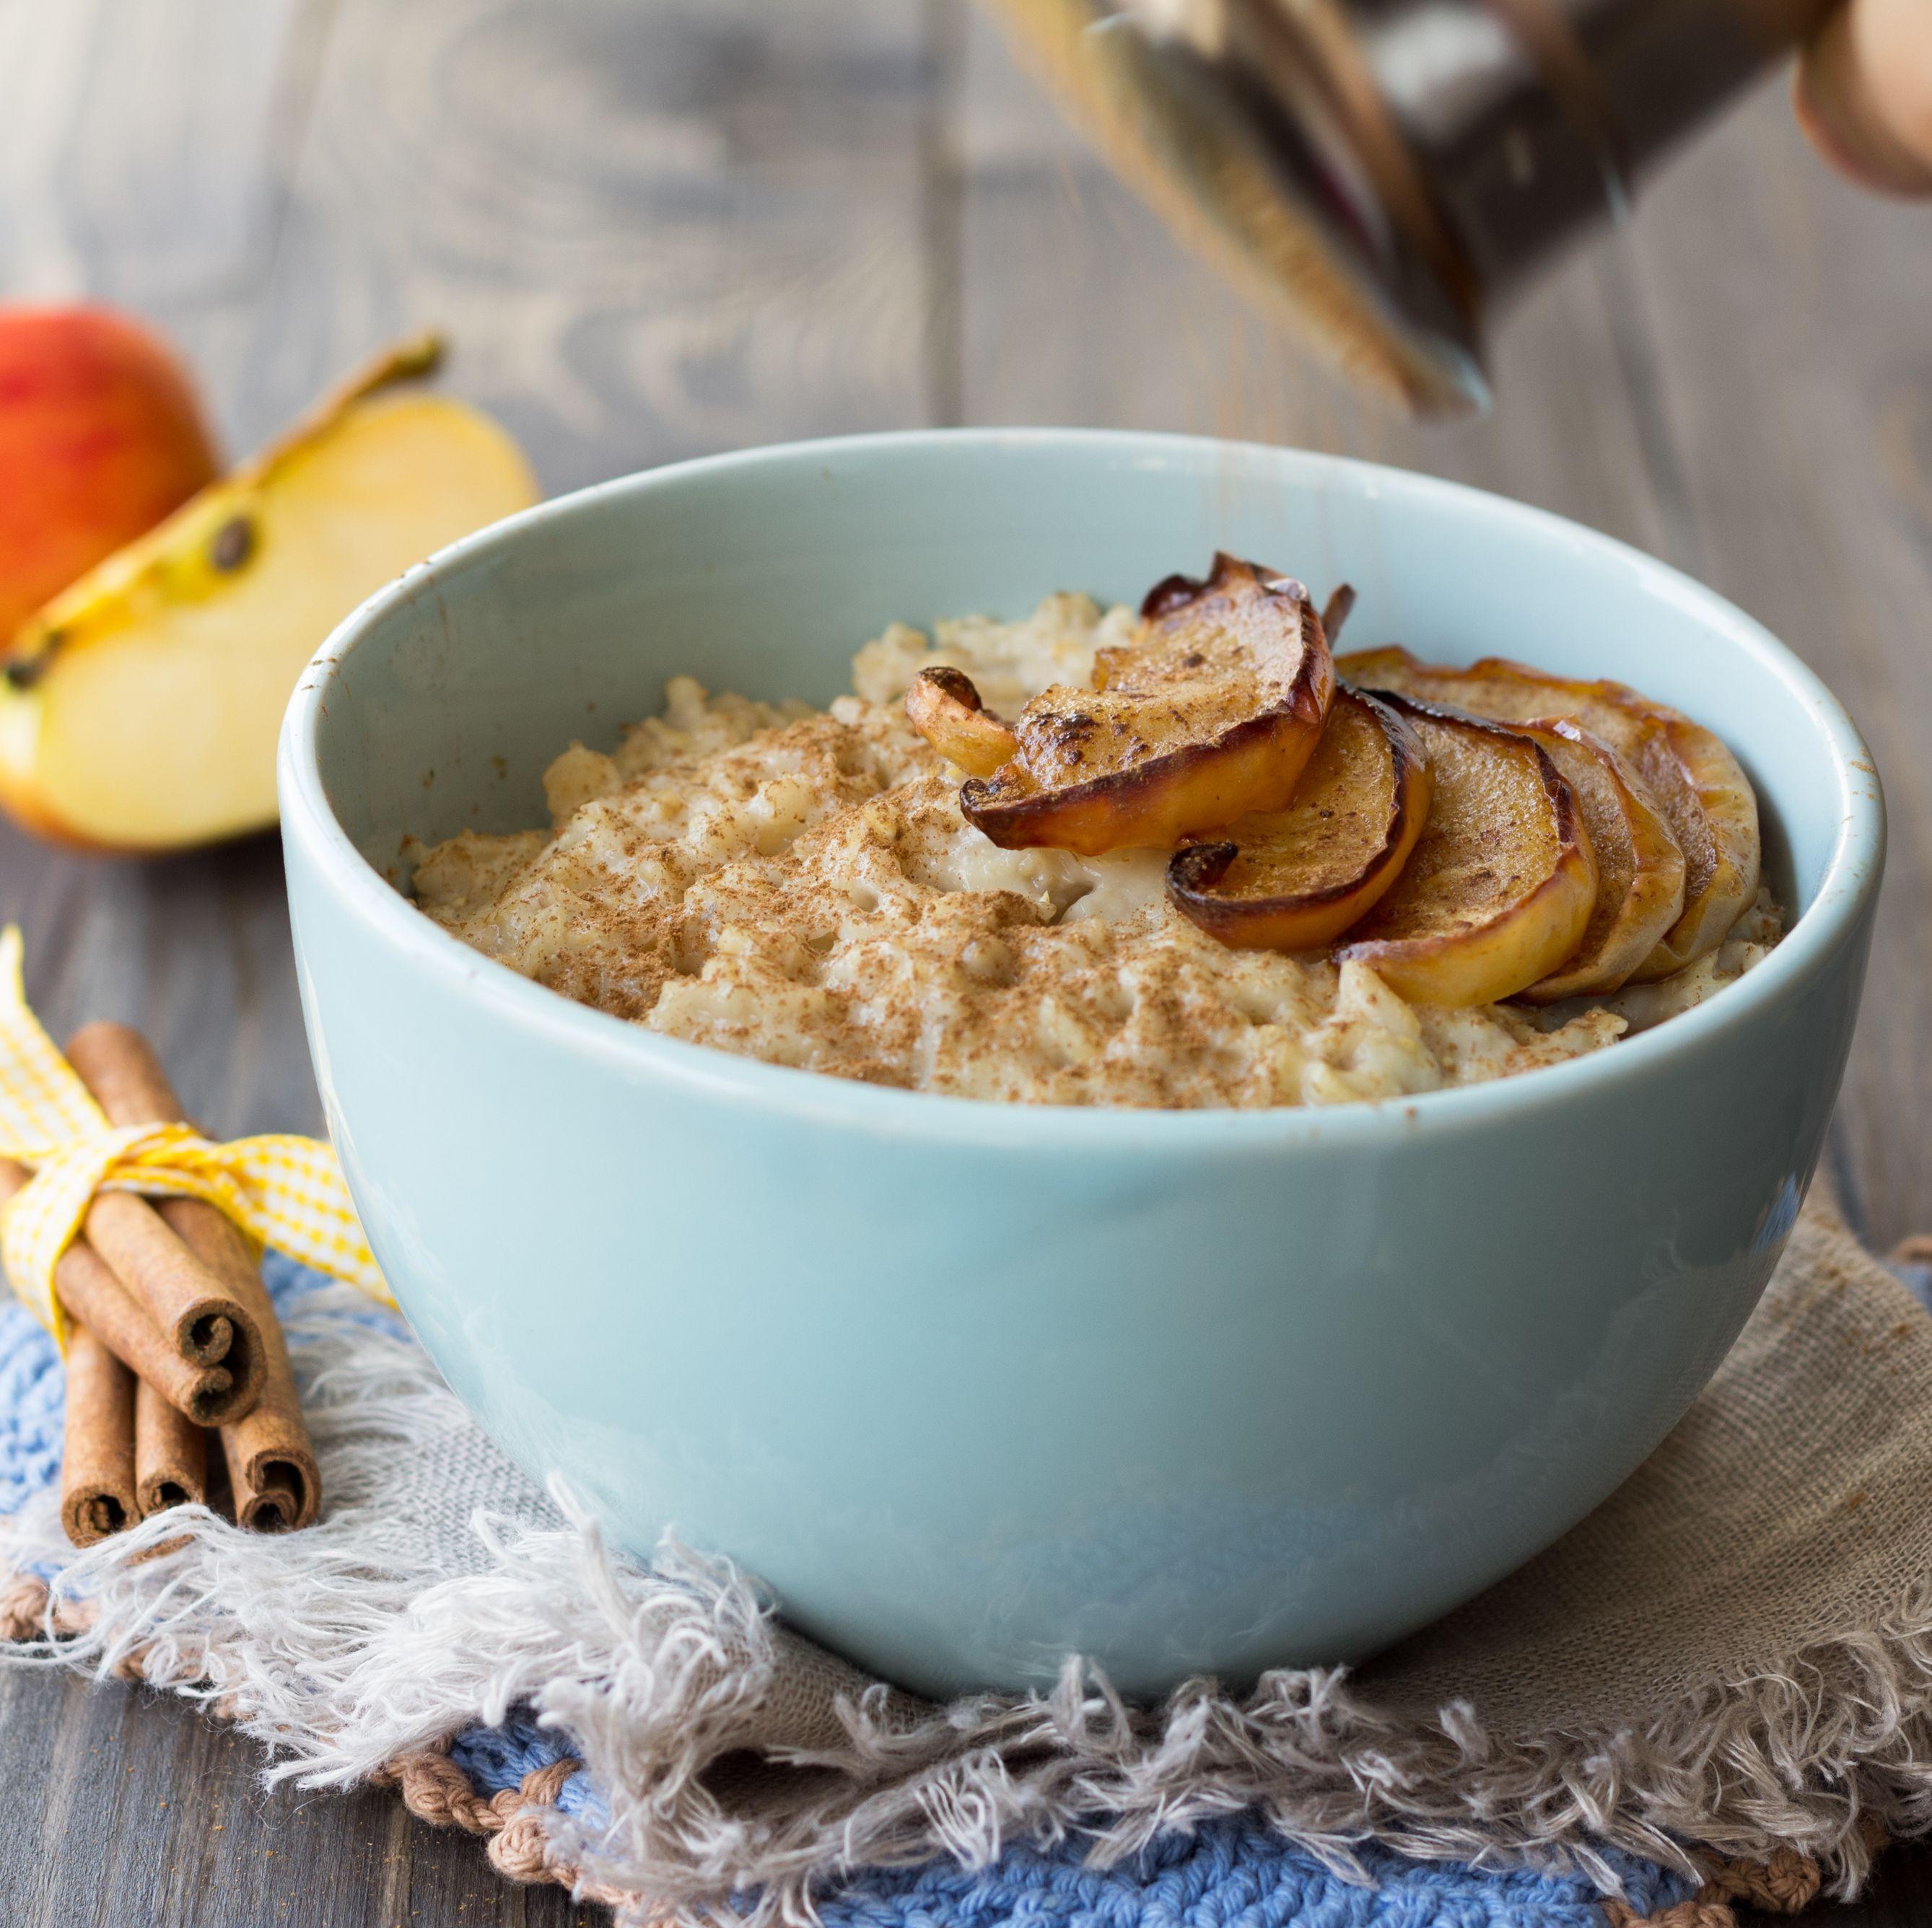 Jennifer Garner's Go-To Oatmeal Recipe Will Be Your New Favorite Breakfast